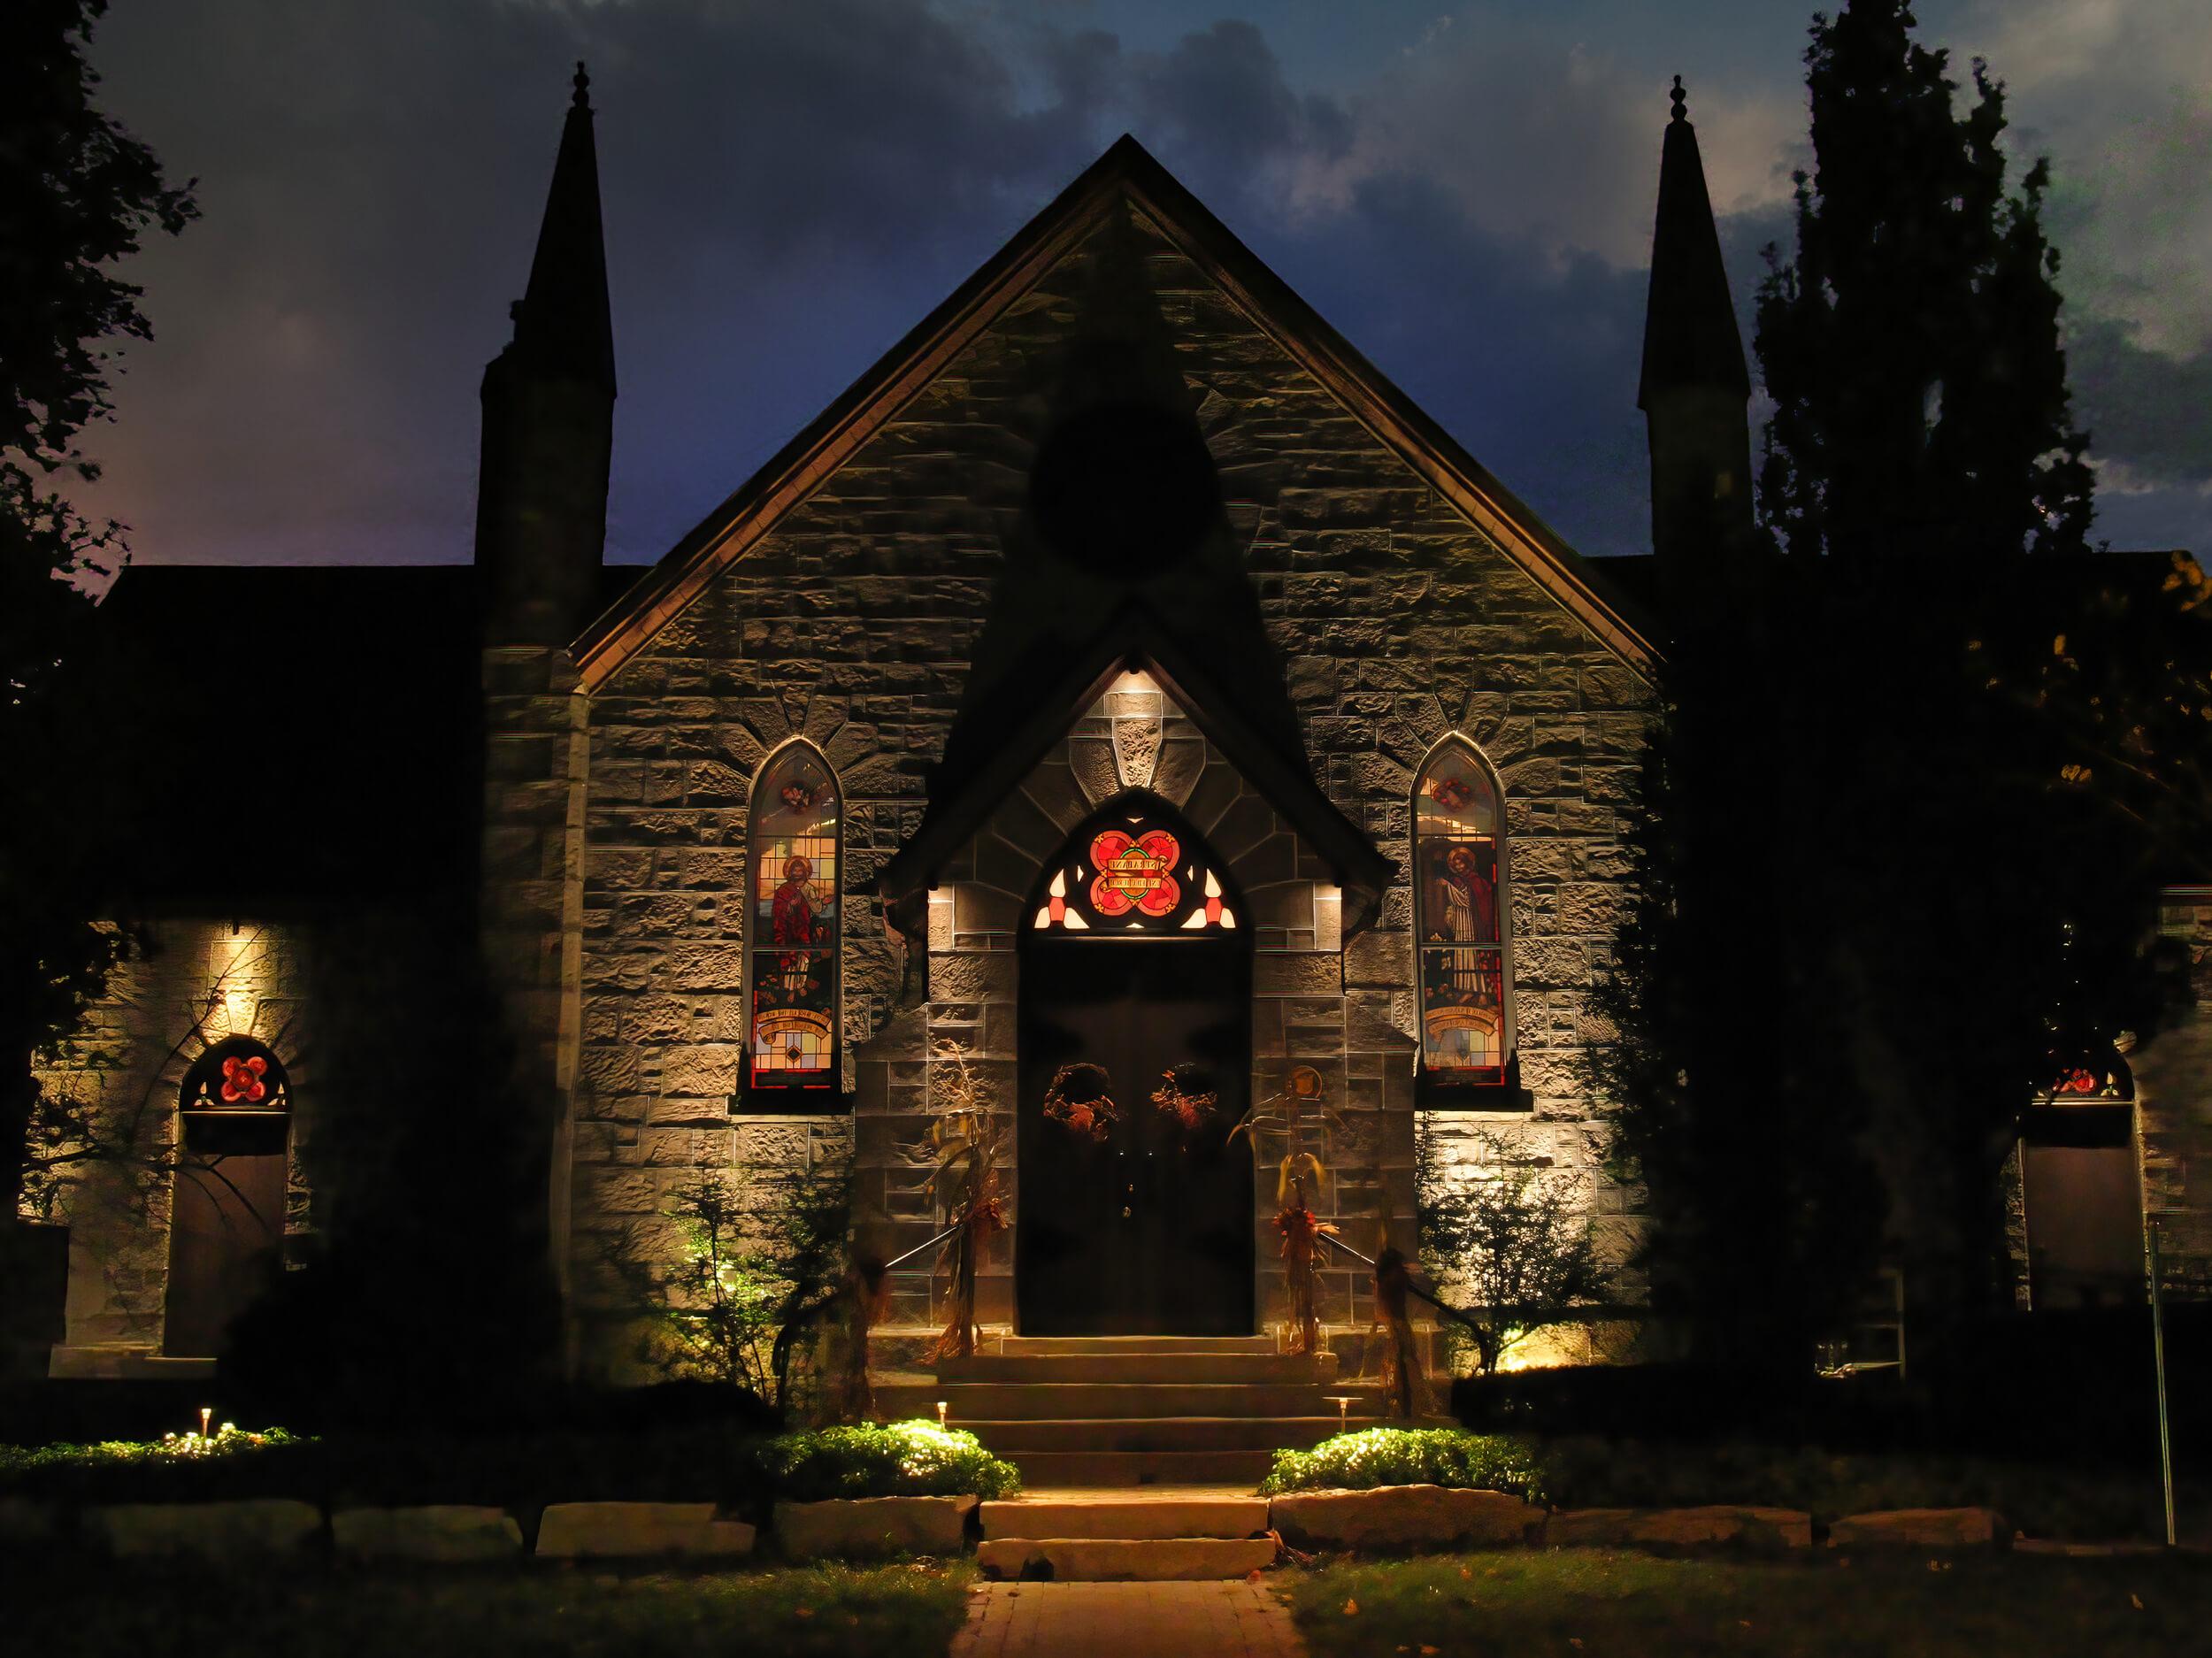 Freelton church graze downlighting gothic